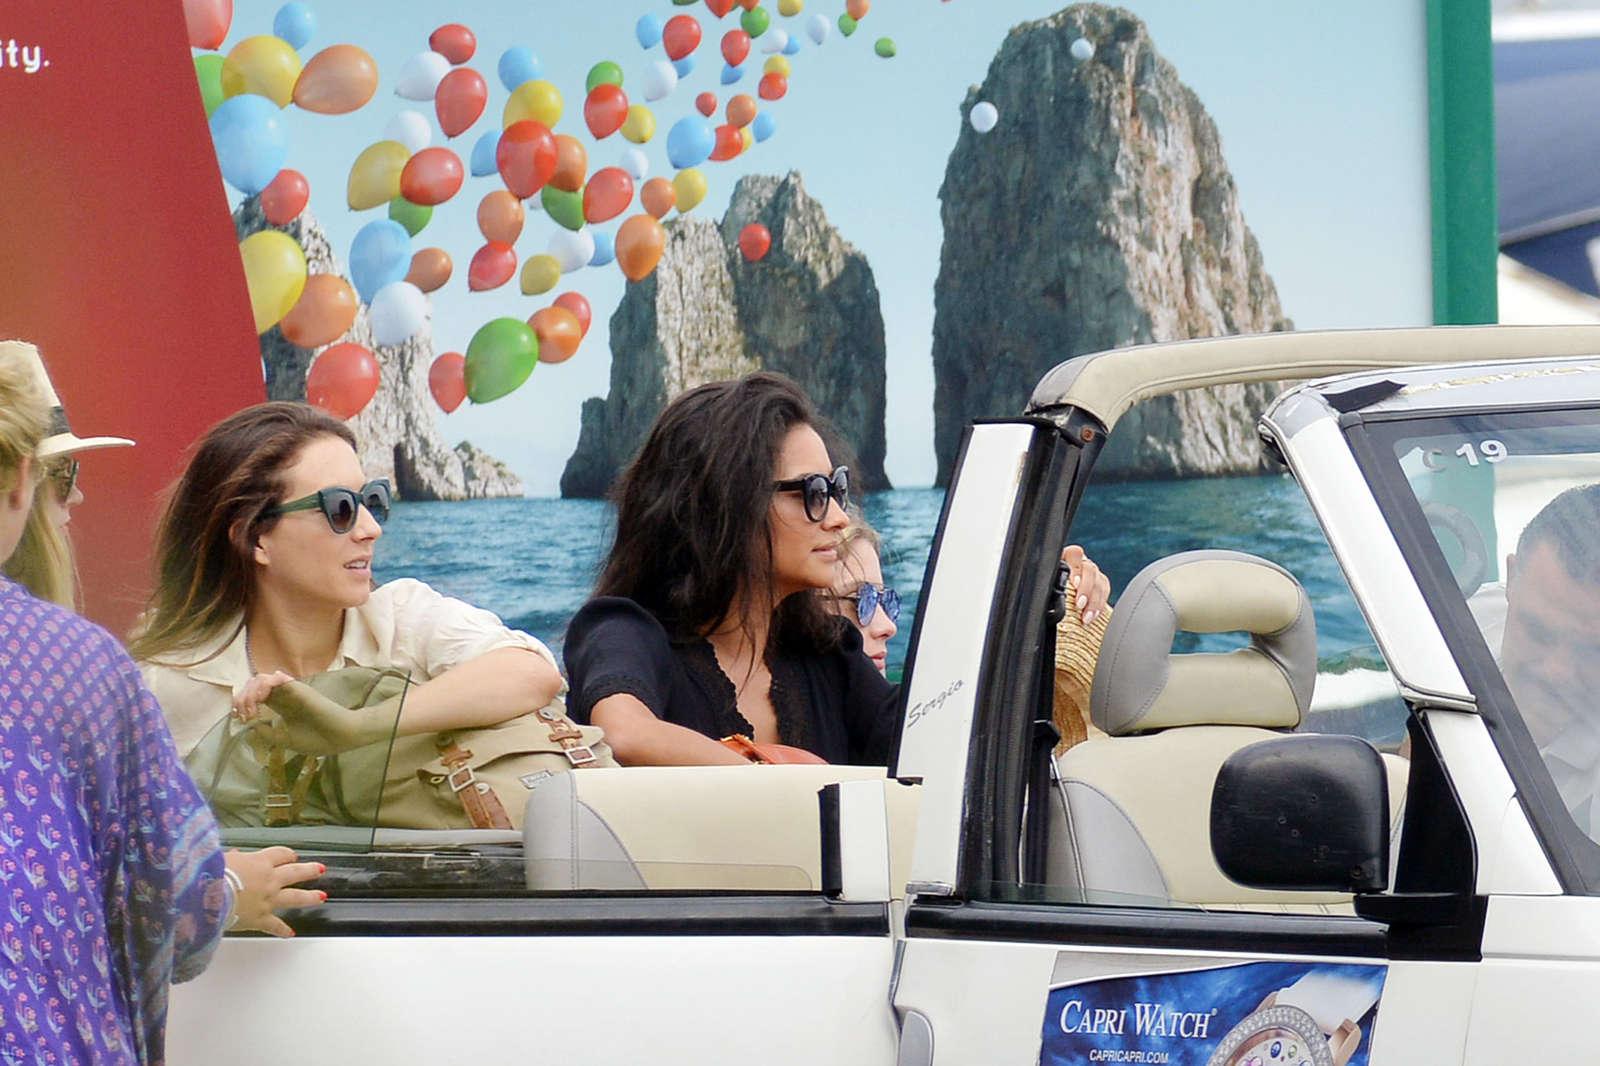 Ashley Benson 2016 : Ashley Benson, Shay Mitchell and Troian Bellisario on a boat in Capri -02